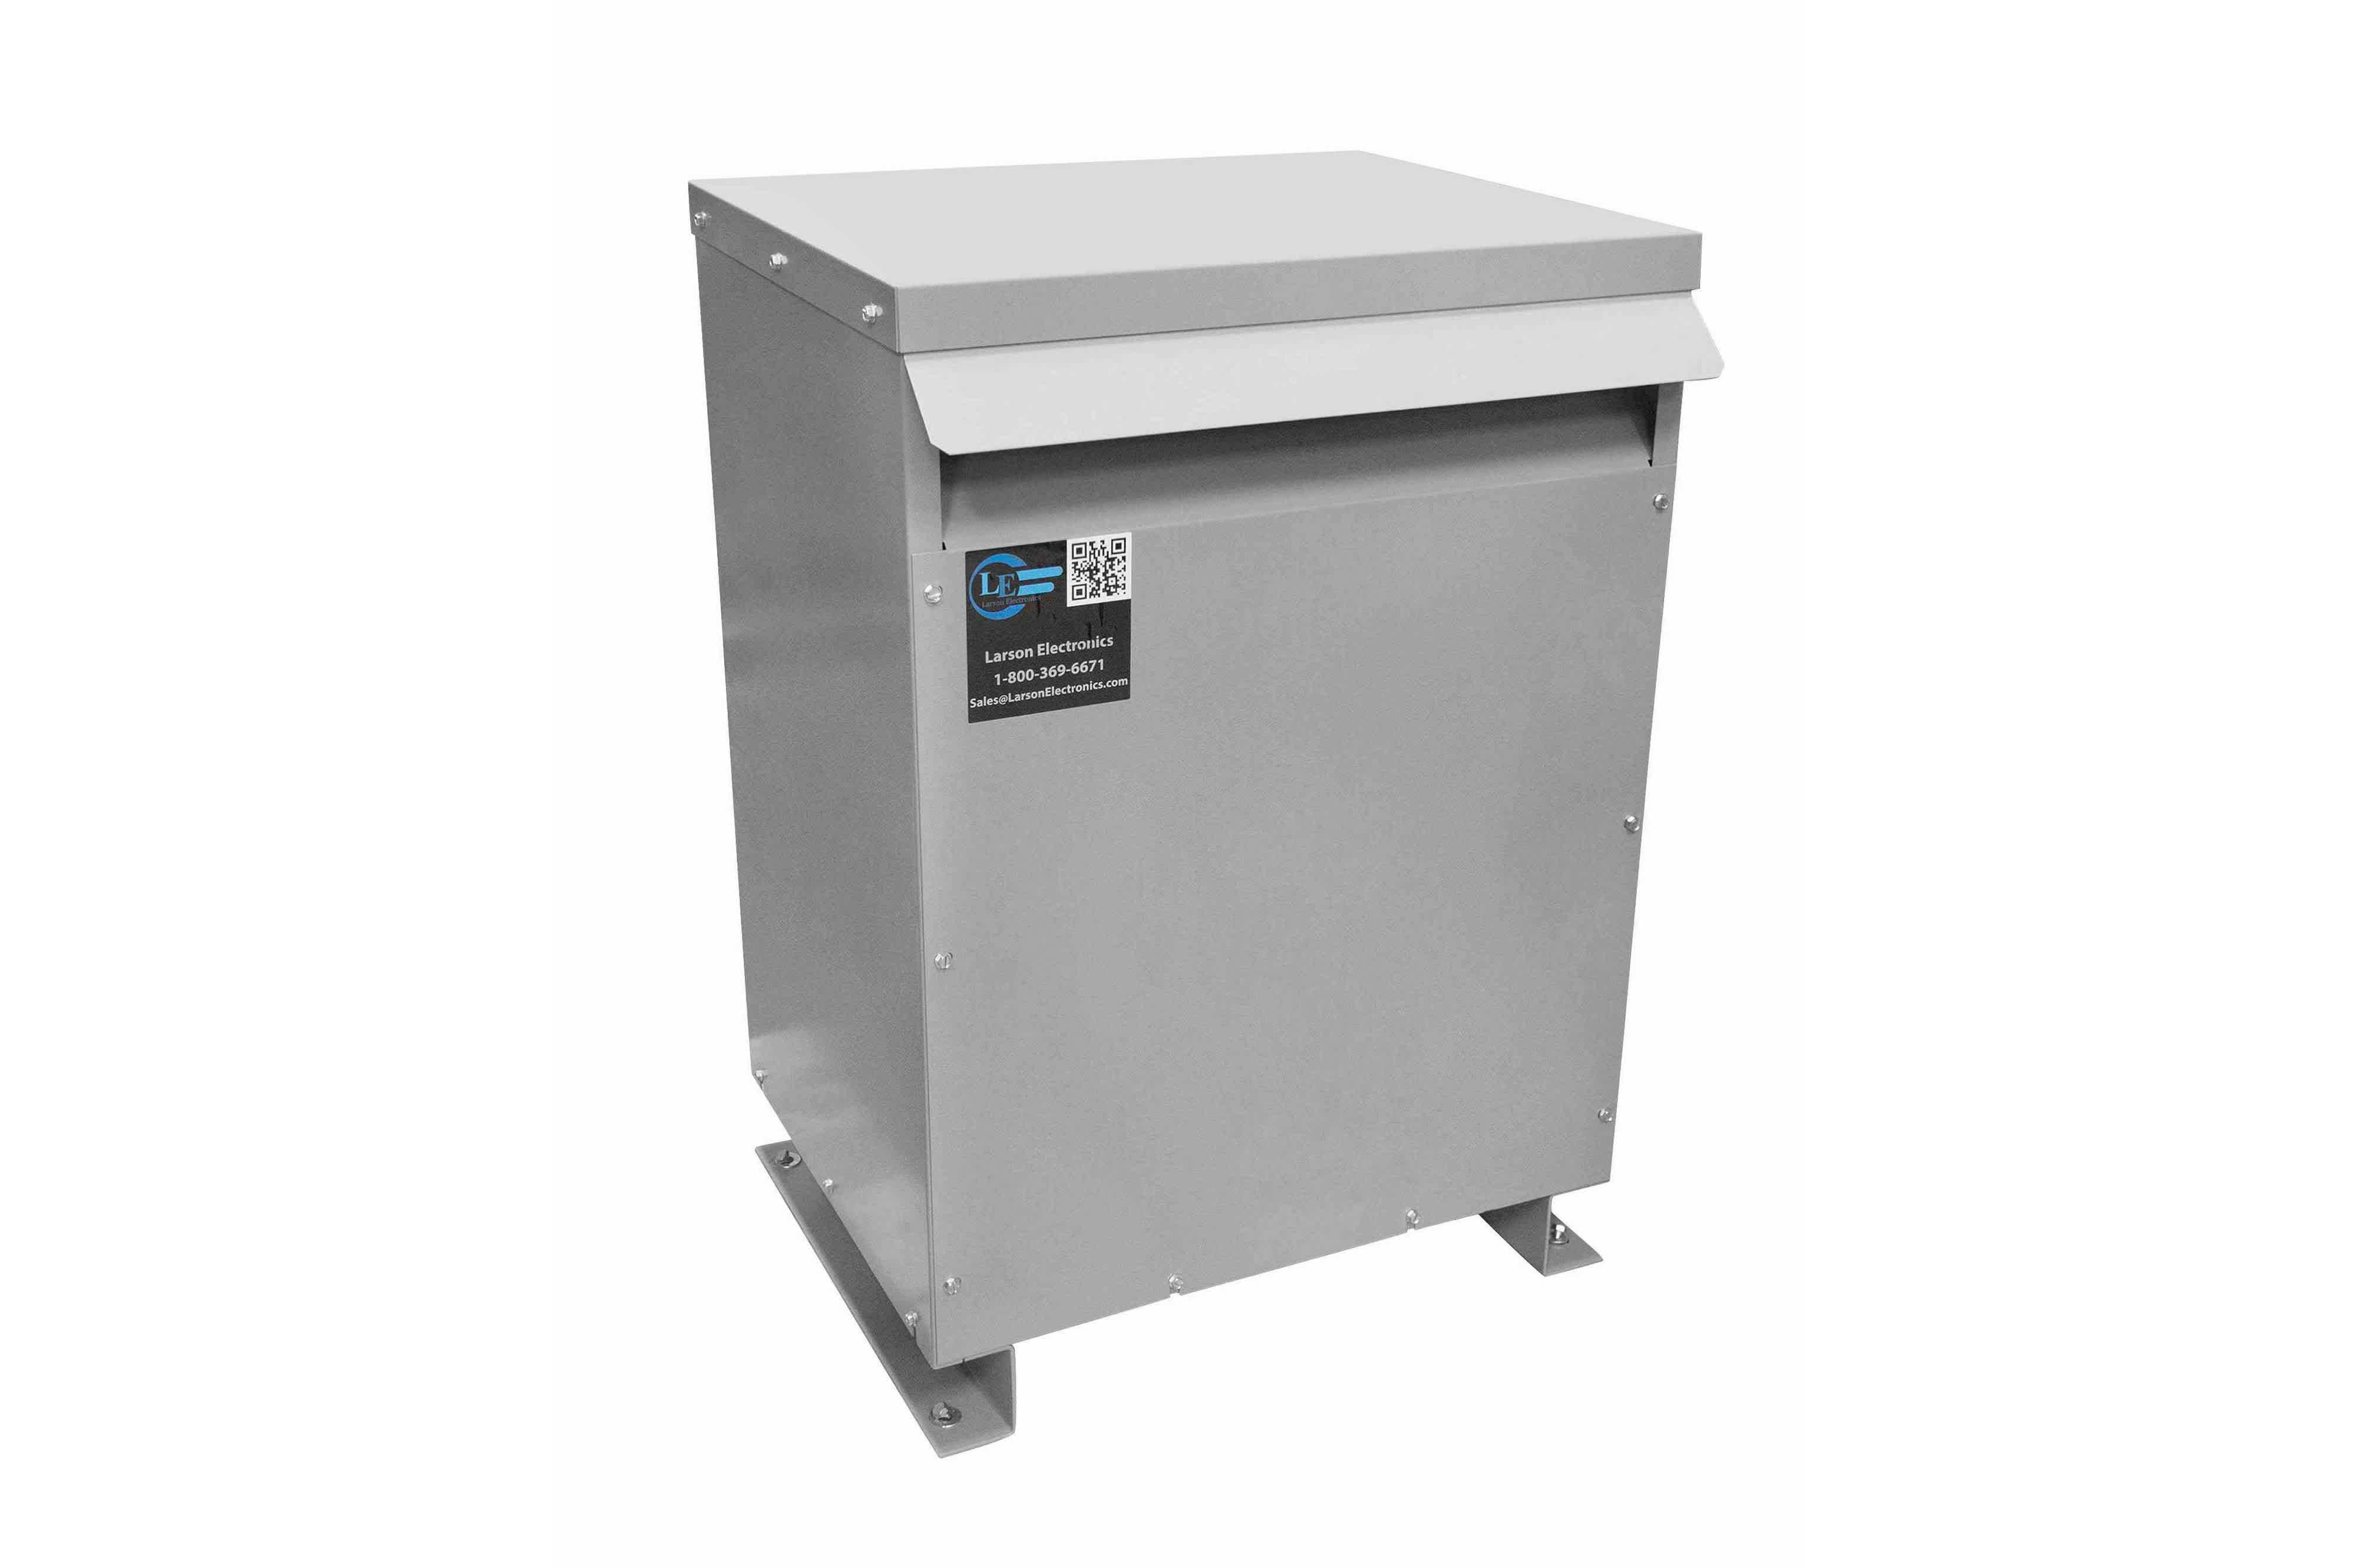 75 kVA 3PH DOE Transformer, 415V Delta Primary, 600Y/347 Wye-N Secondary, N3R, Ventilated, 60 Hz